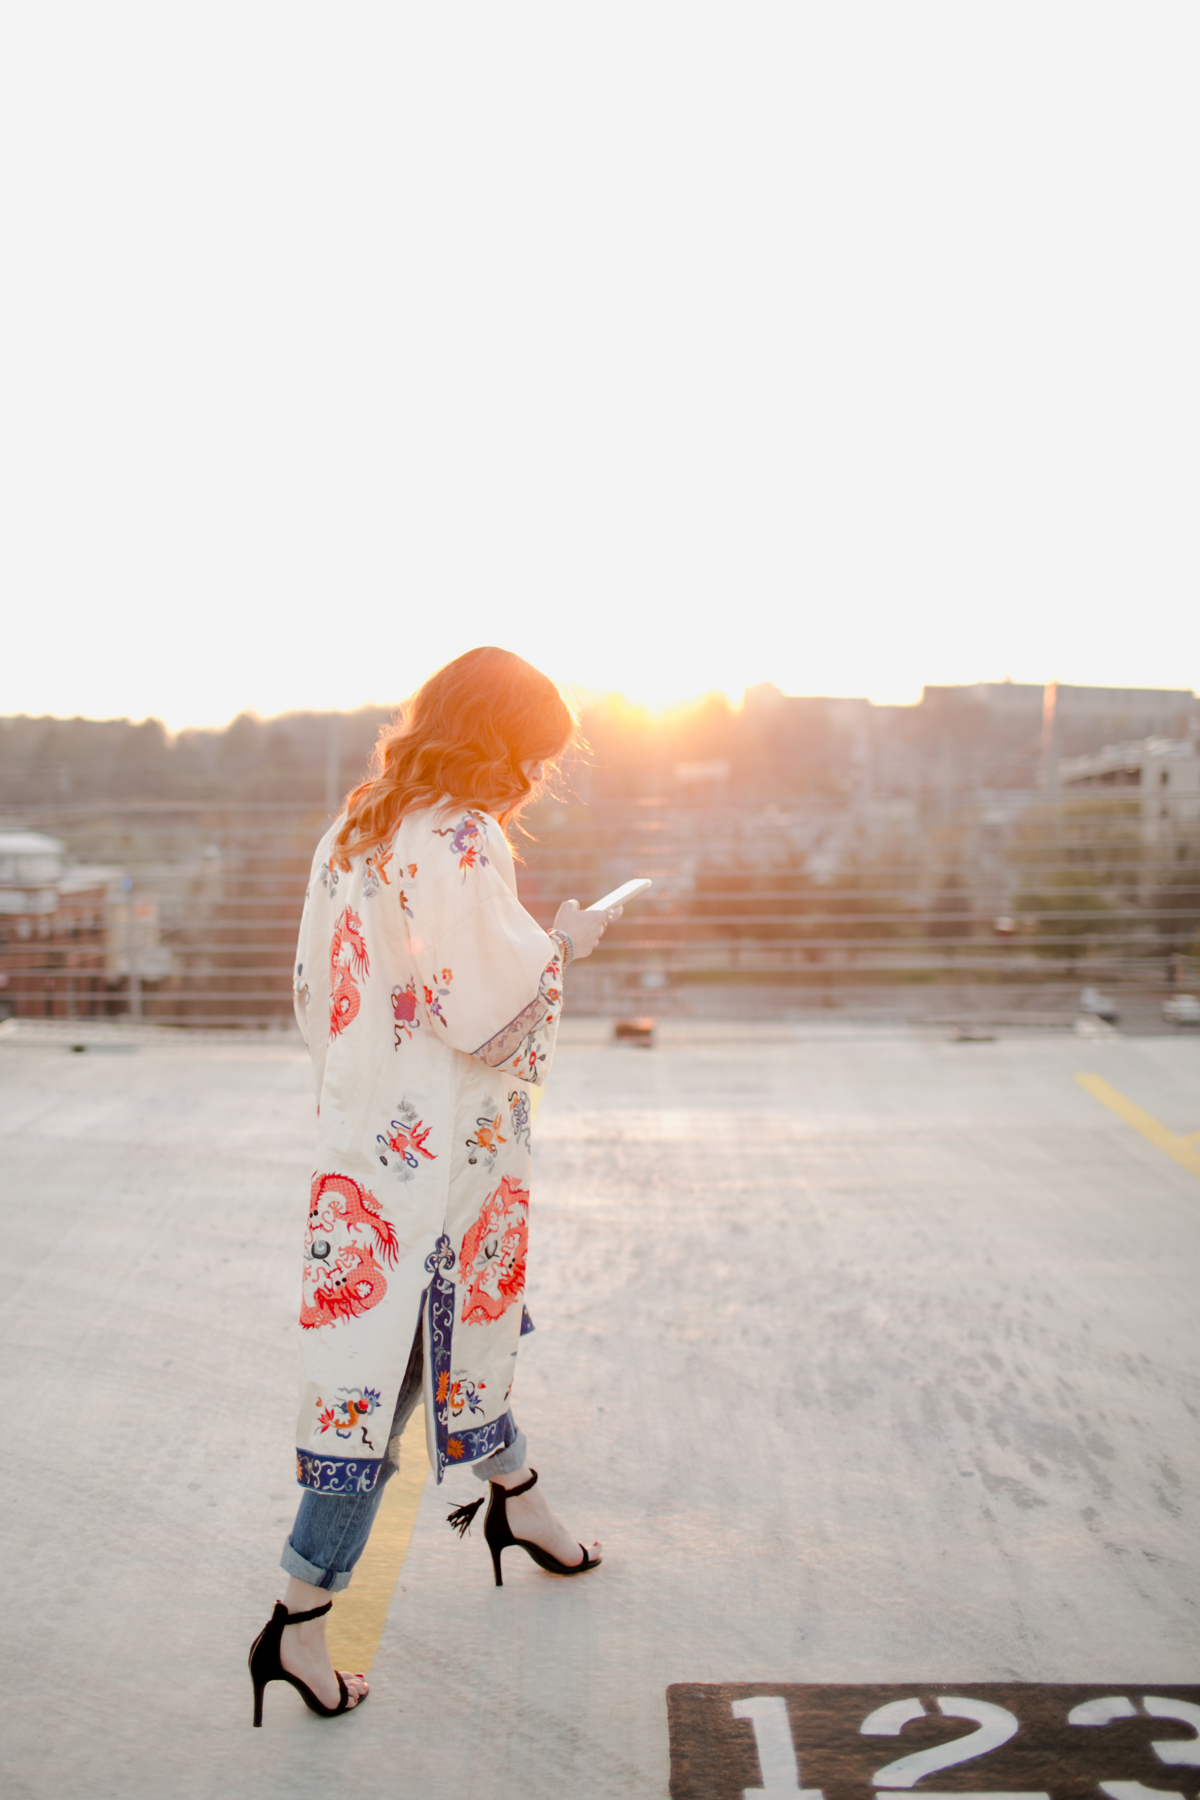 Eldridge_Edit_Anna_E_Cottrell_Tulip_Louise_Fashion_Blogger_Kimono_Deconstructed_Oversized_Boyfriend_Jean_Denim_Mother-White_T-shirt_Tom_Ford_Glasses_Joie_Heel_4.jpg